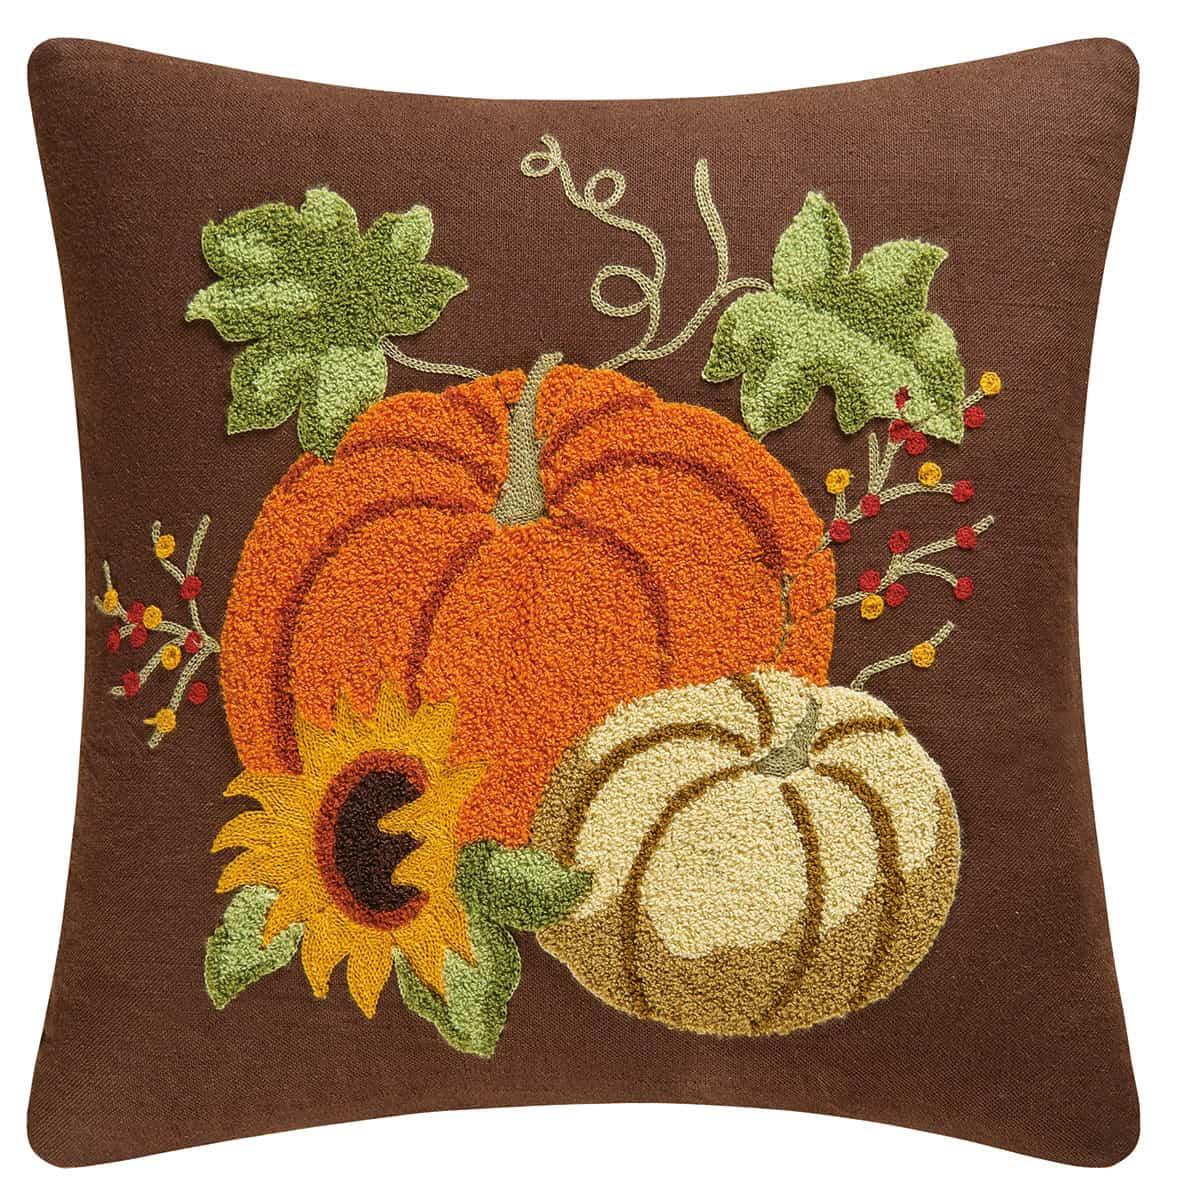 7 fall home decor pillows 3 boys and a dog autumn splendo rice stitch throw pillow 86154047